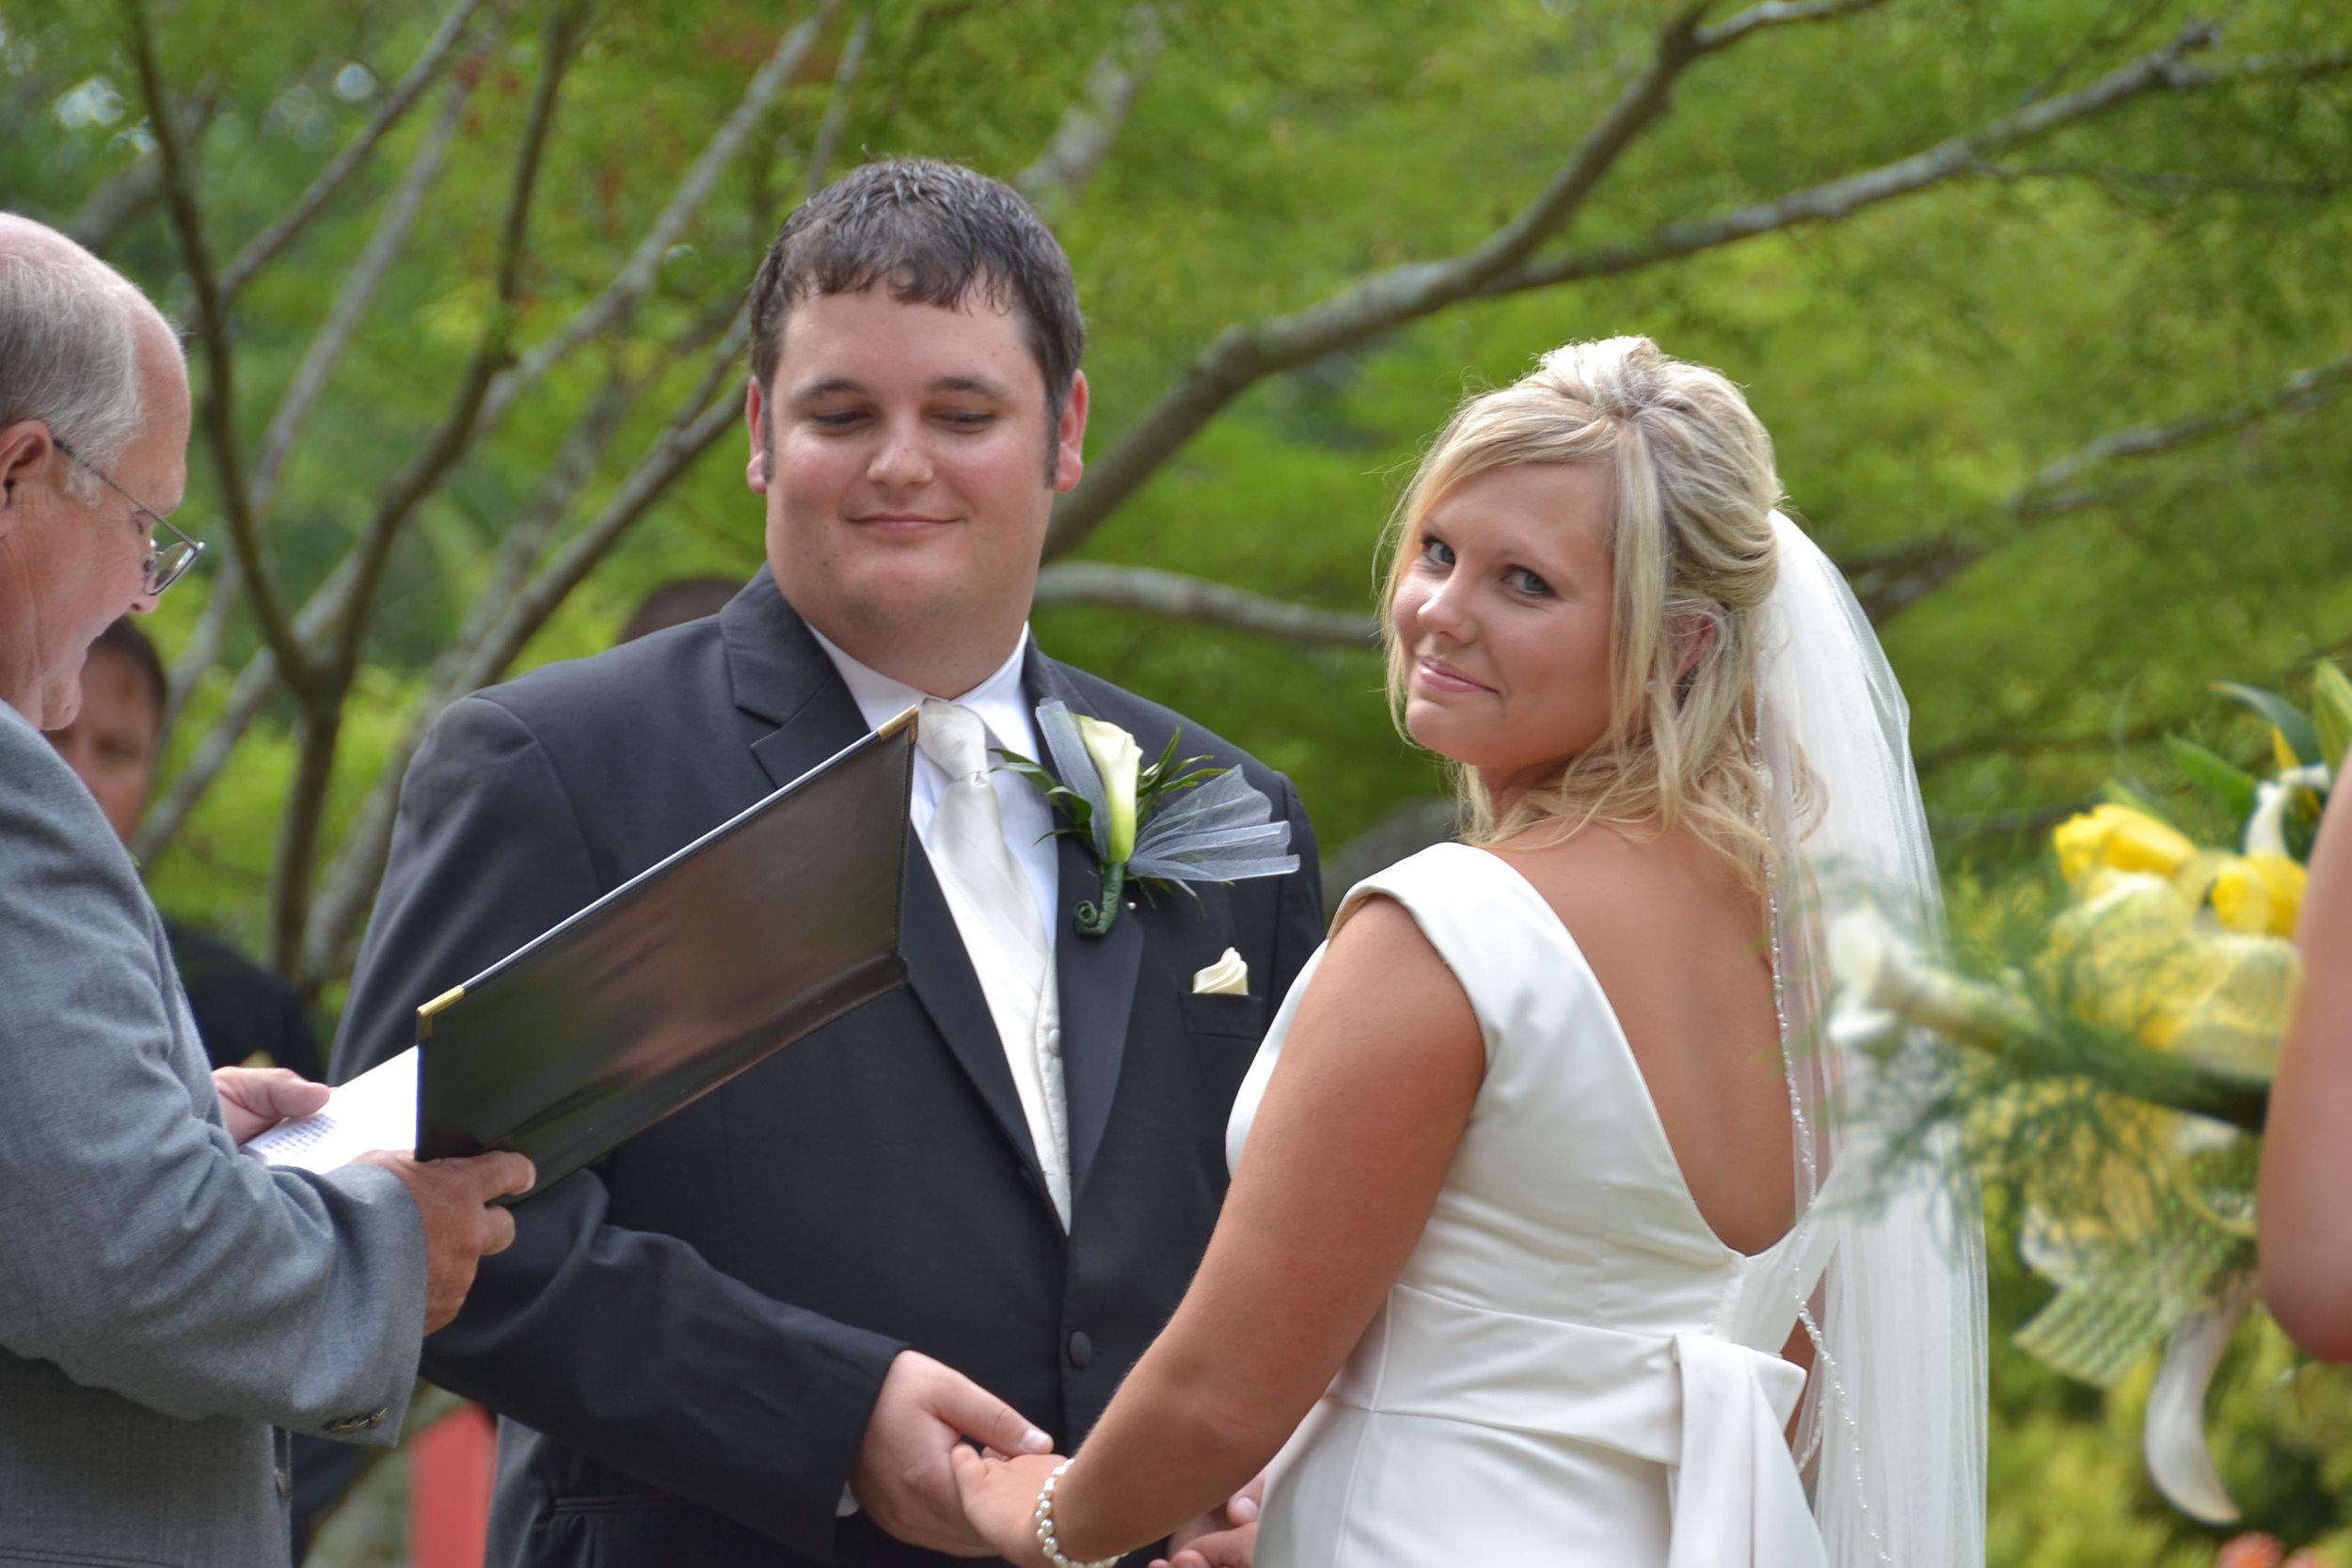 Wedding Ceremony at the Wilmington arboretum.